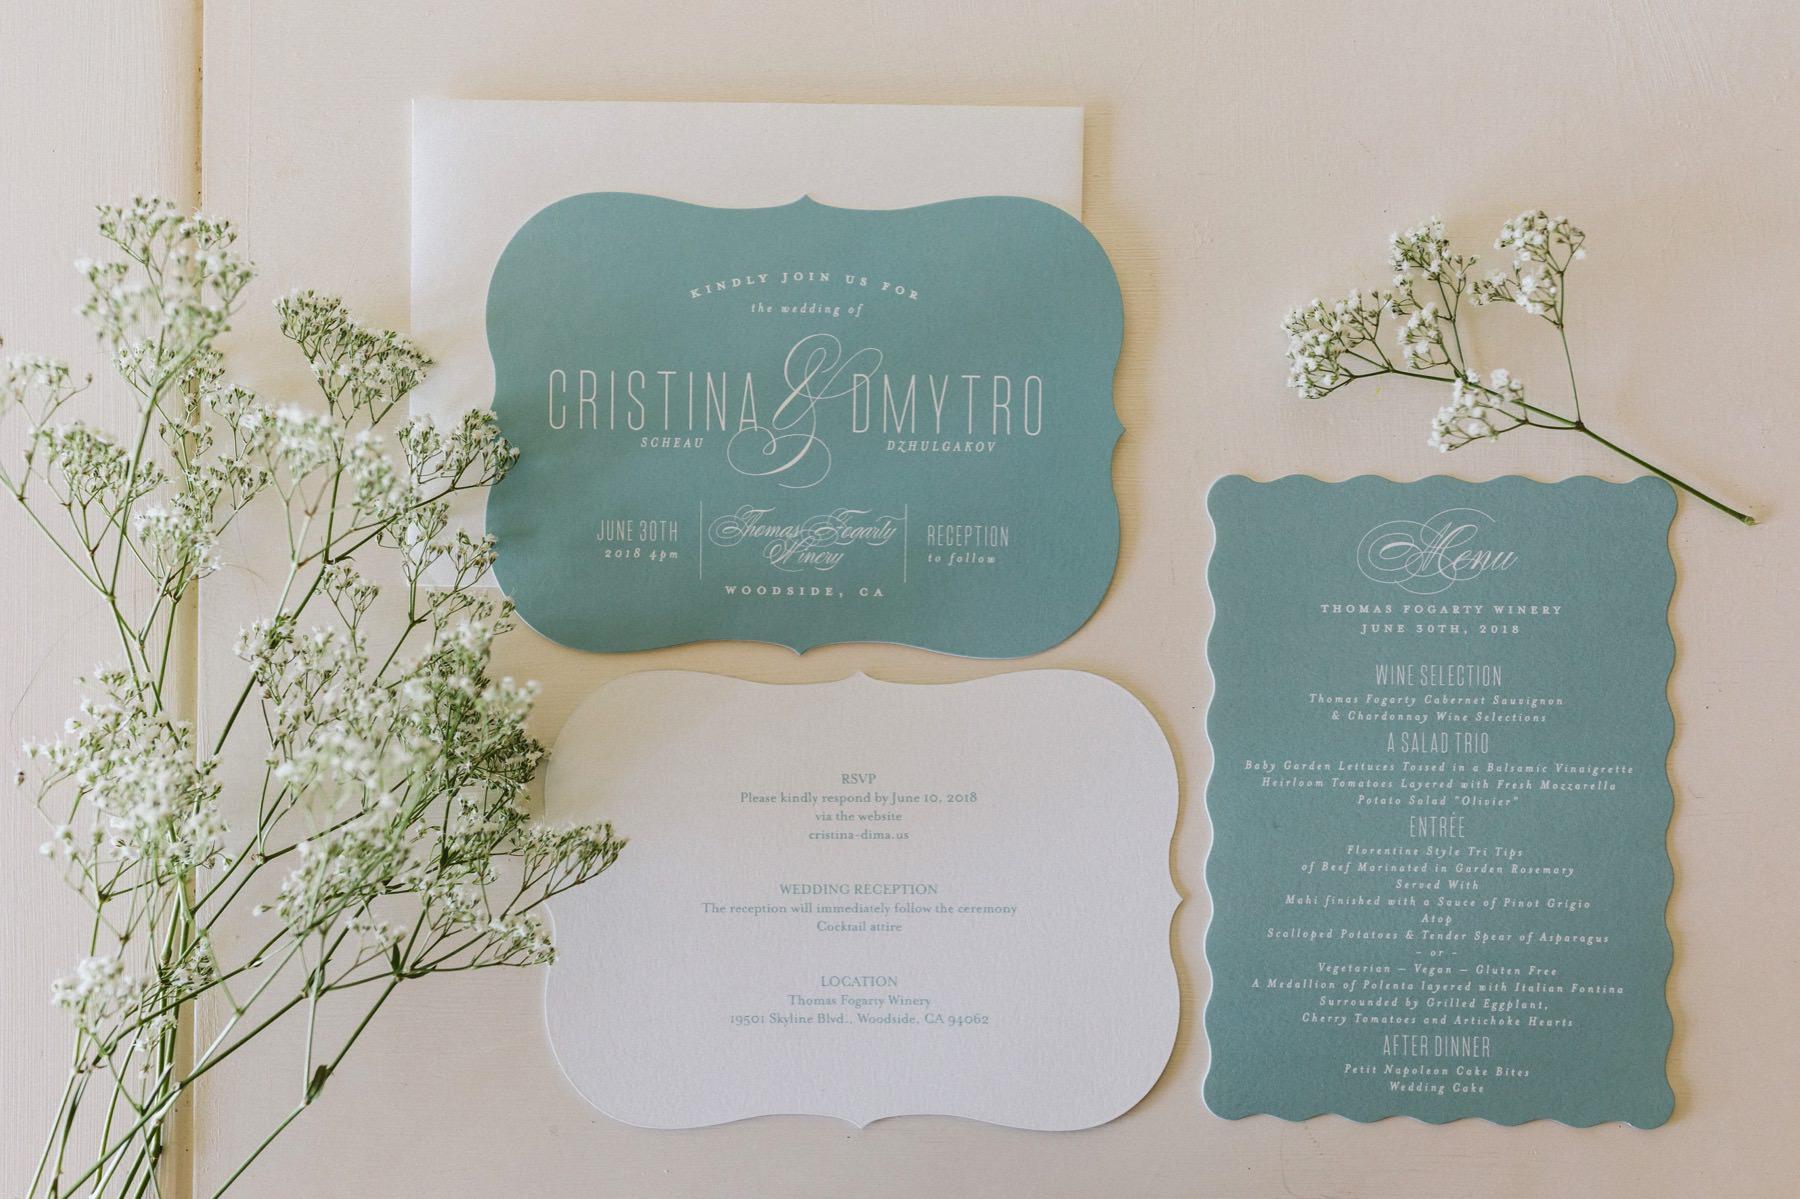 Palo Alto wedding